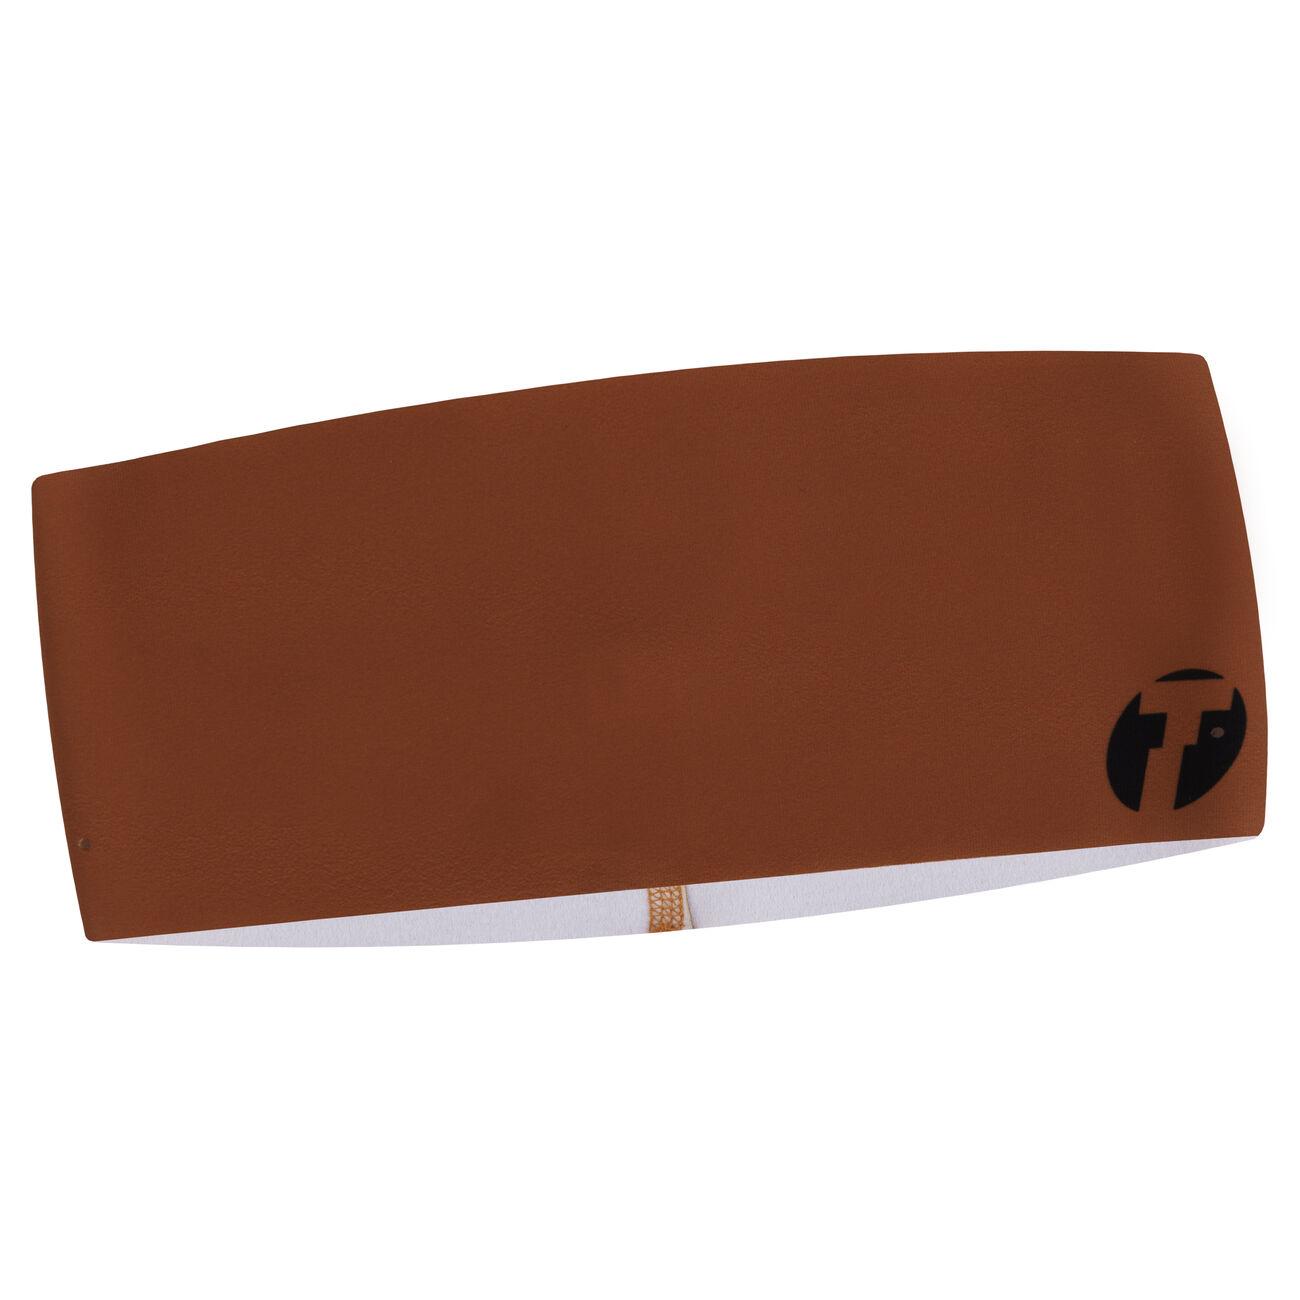 Bi-elastic Air pannband